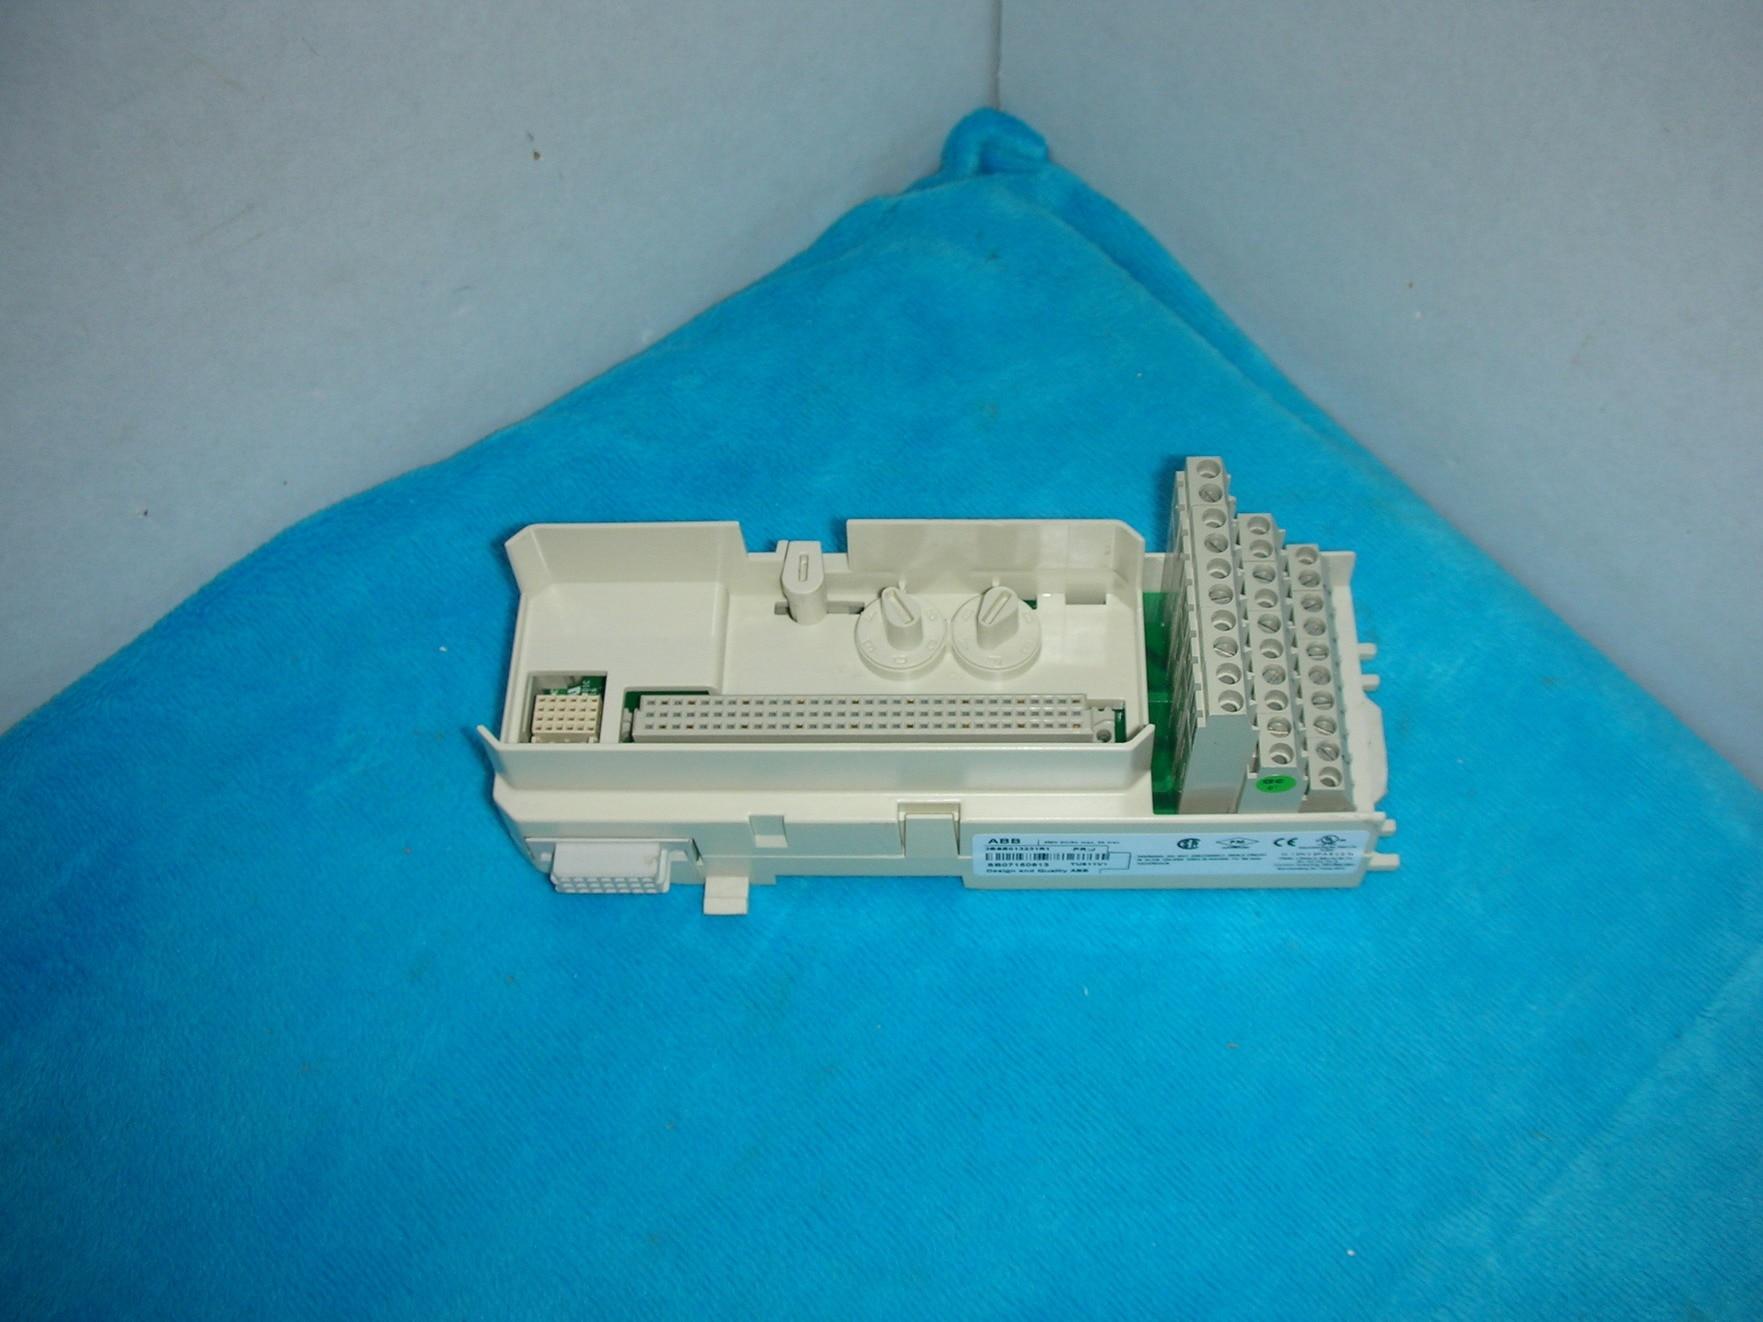 1PC USED 3BSE013231R1 TU811V1 1pc used 3bse013231r1 tu811v1